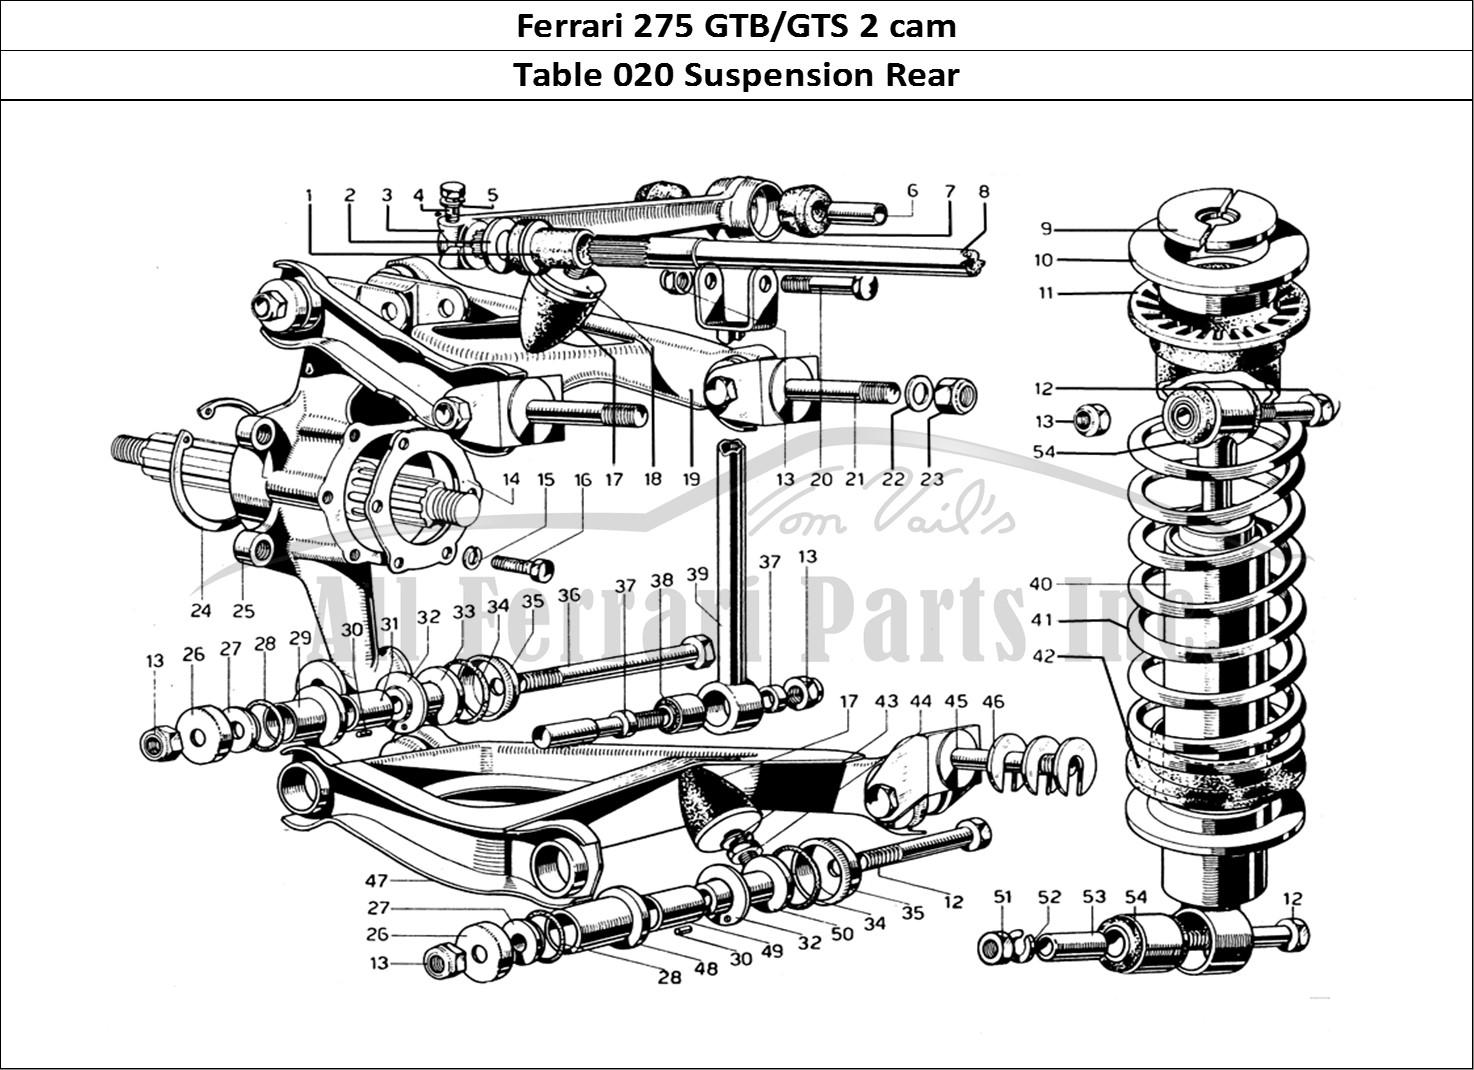 Buy Original Ferrari 275 Gtb Gts 2 Cam 020 Suspension Rear